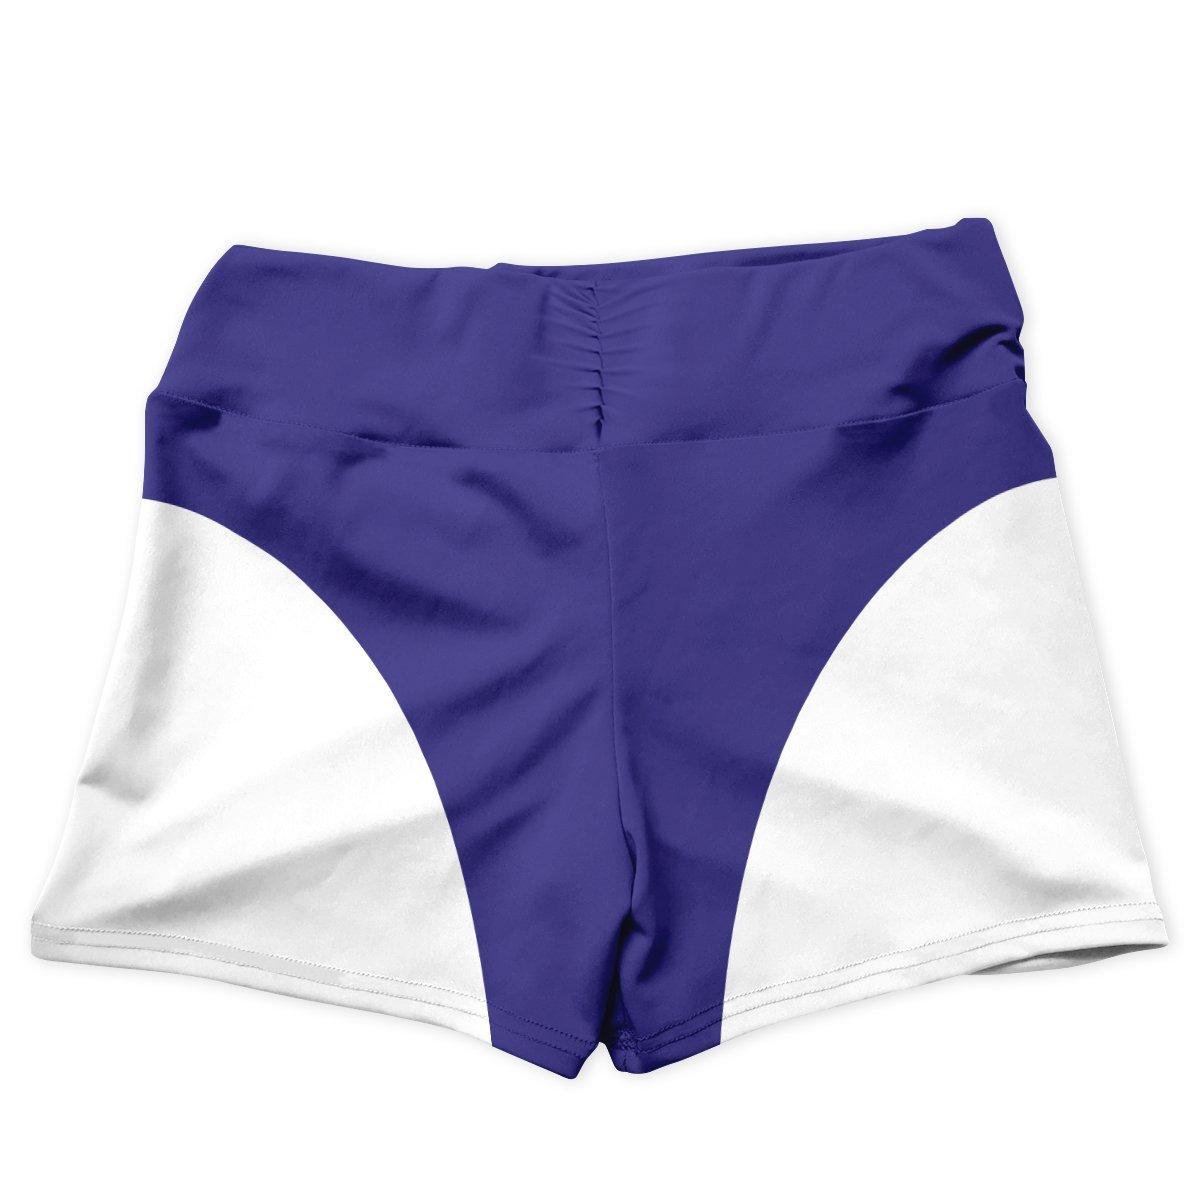 nagatoro active wear set 884144 - Anime Swimsuits